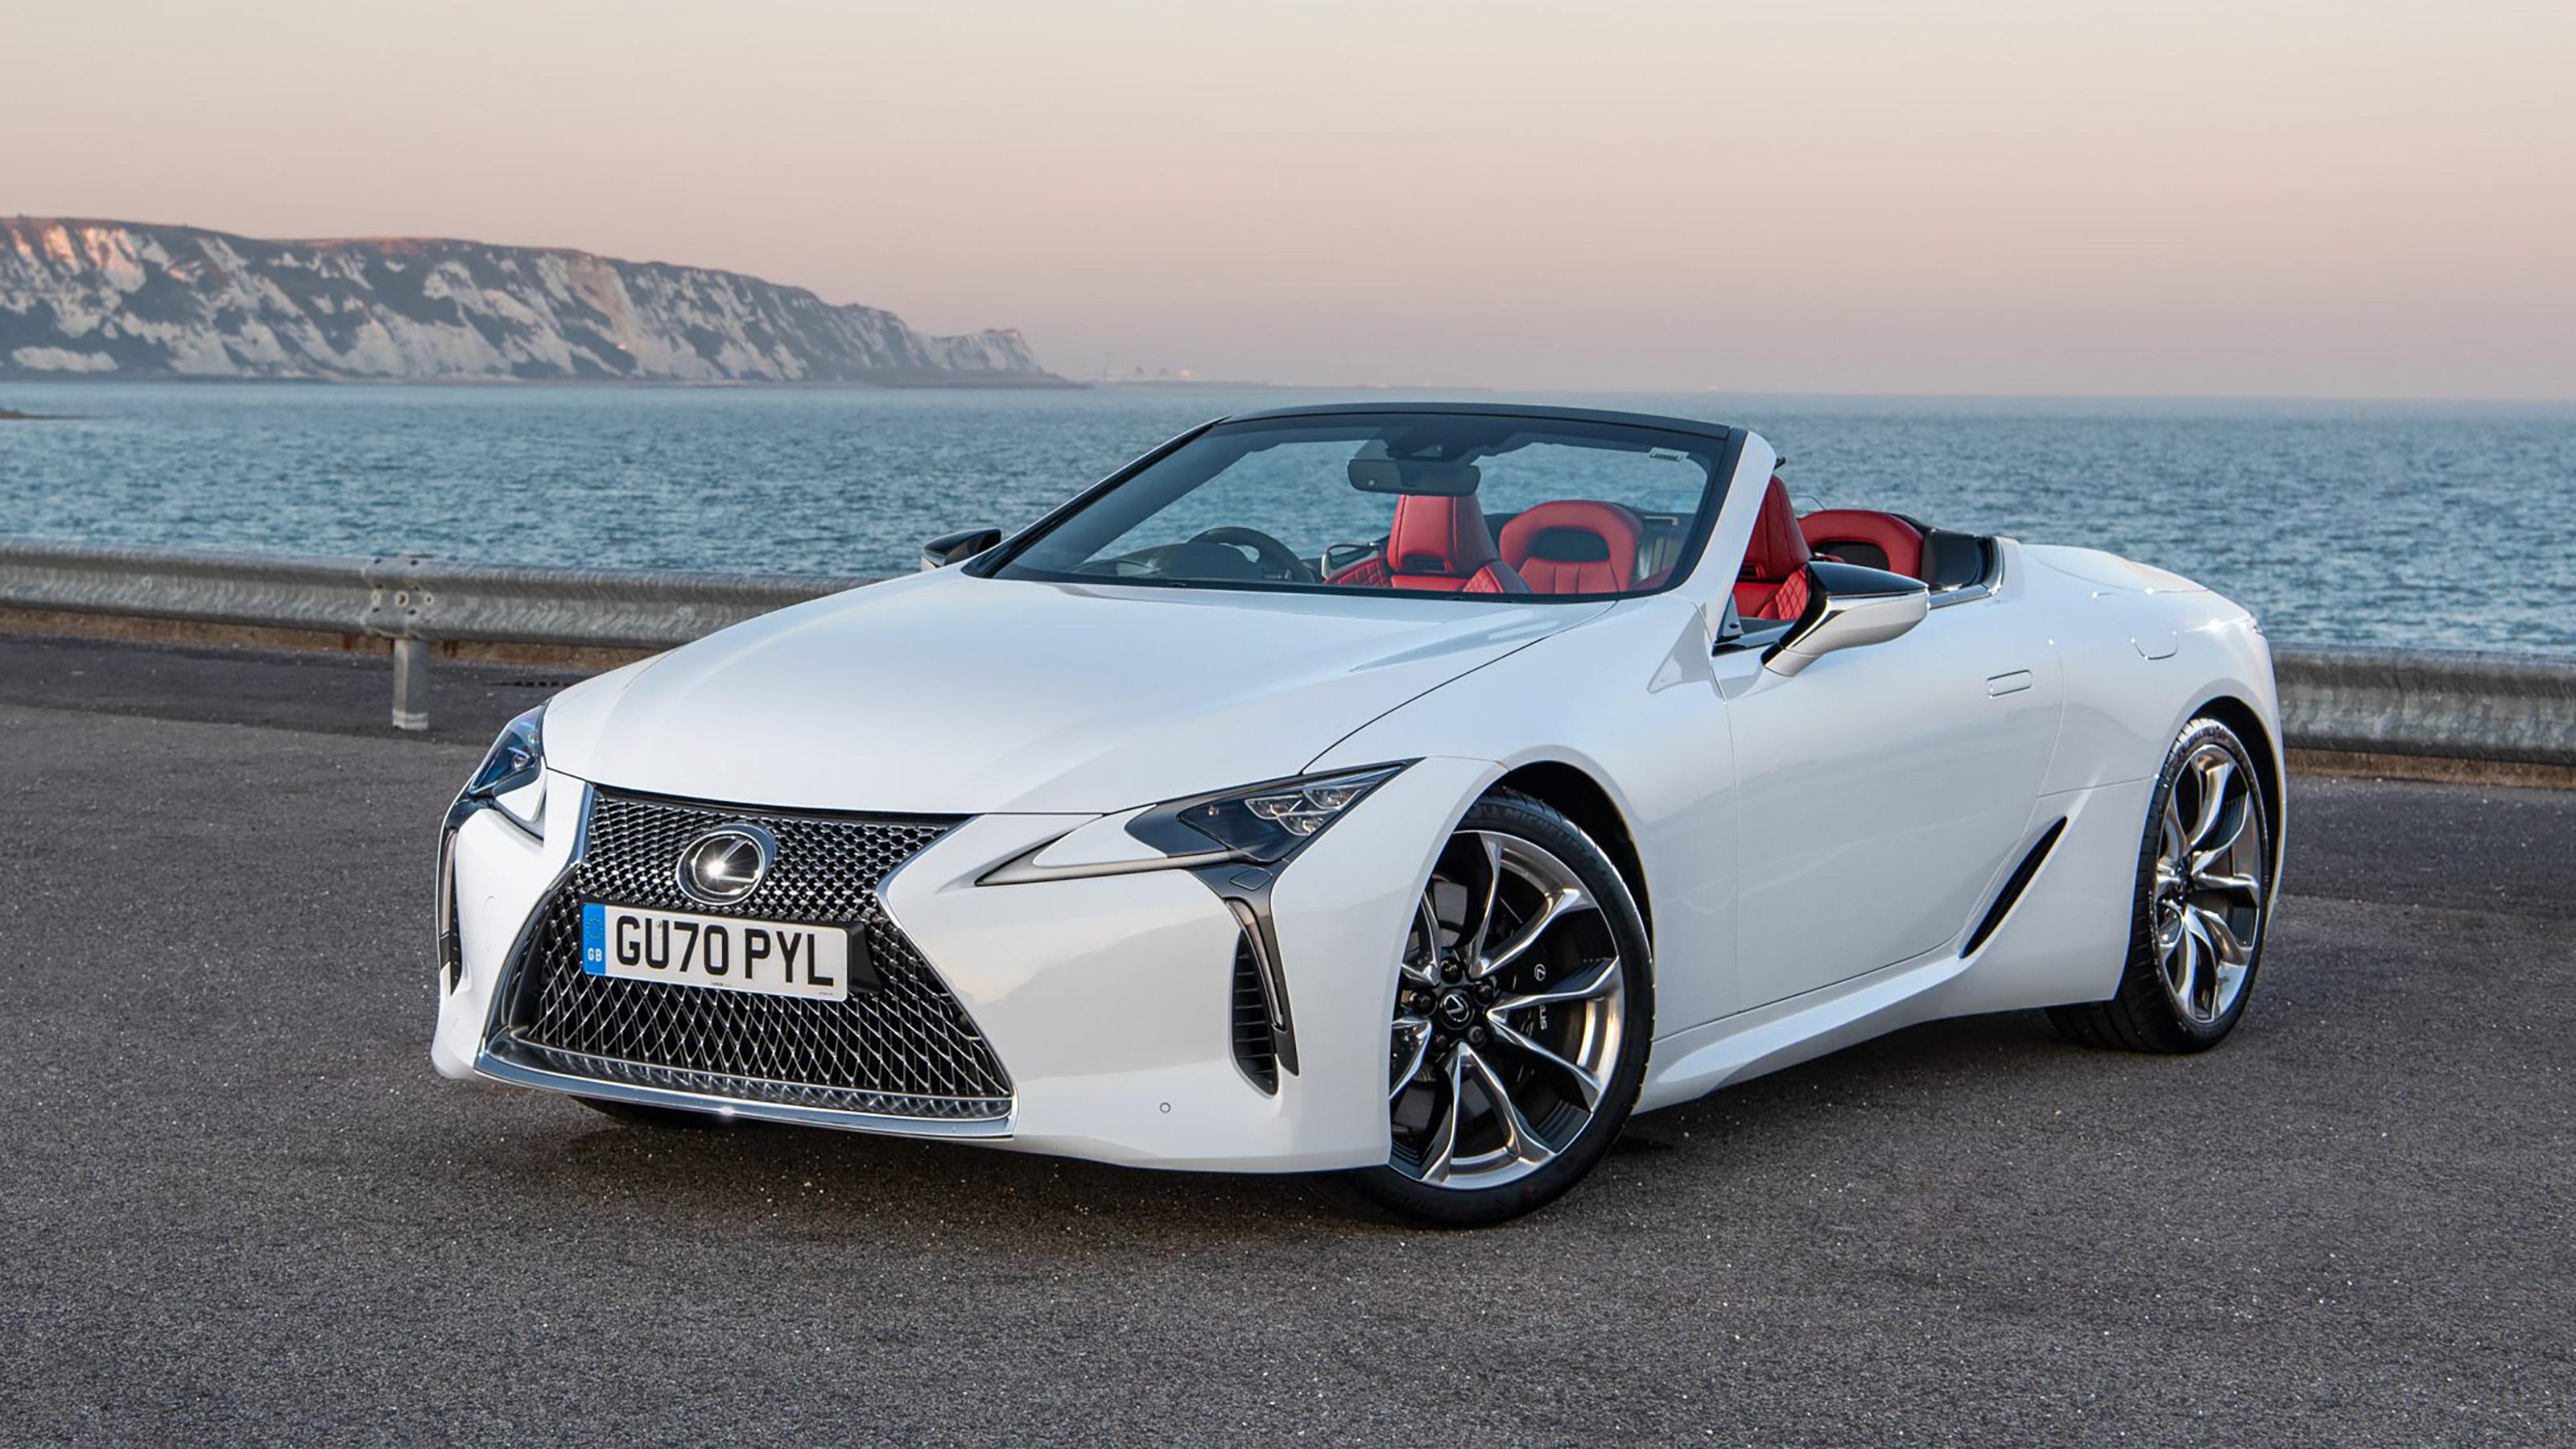 457bhp Lexus Lc500 Convertible On Sale From 90 775 Evo